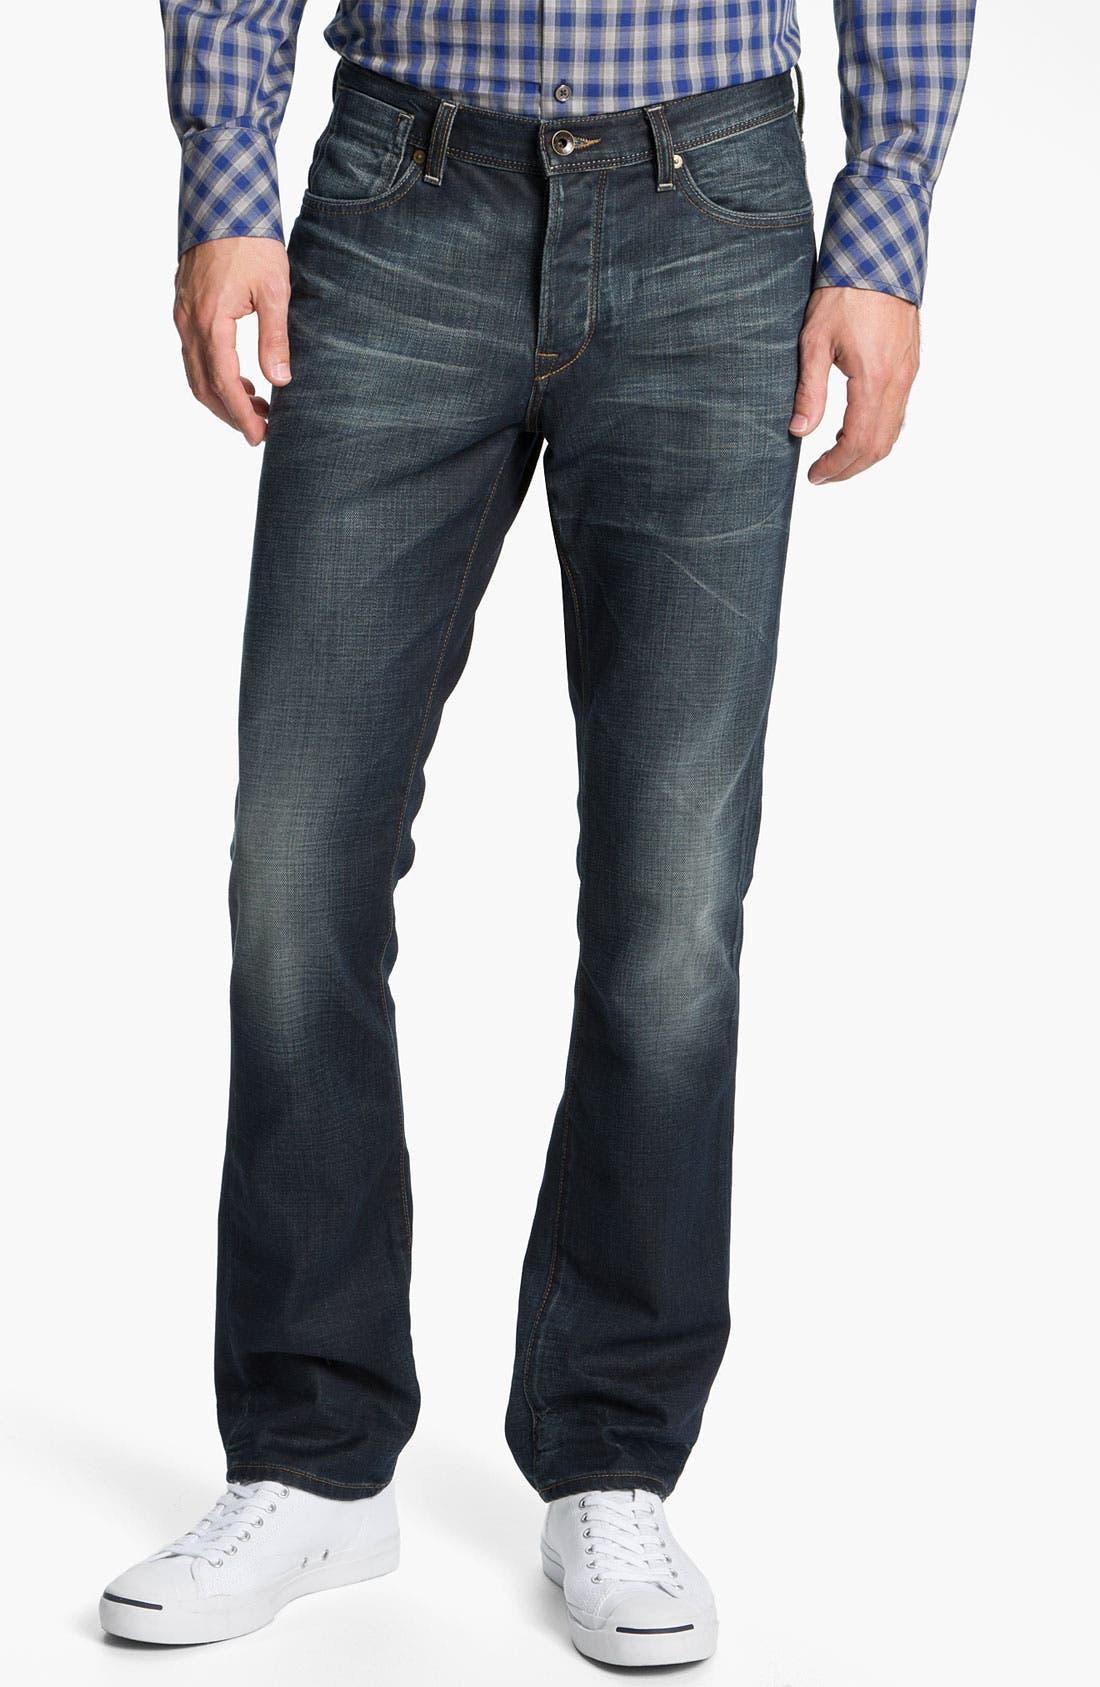 Alternate Image 1 Selected - John Varvatos 'Bowery' Slim Straight Leg Jeans (Dark Indigo)